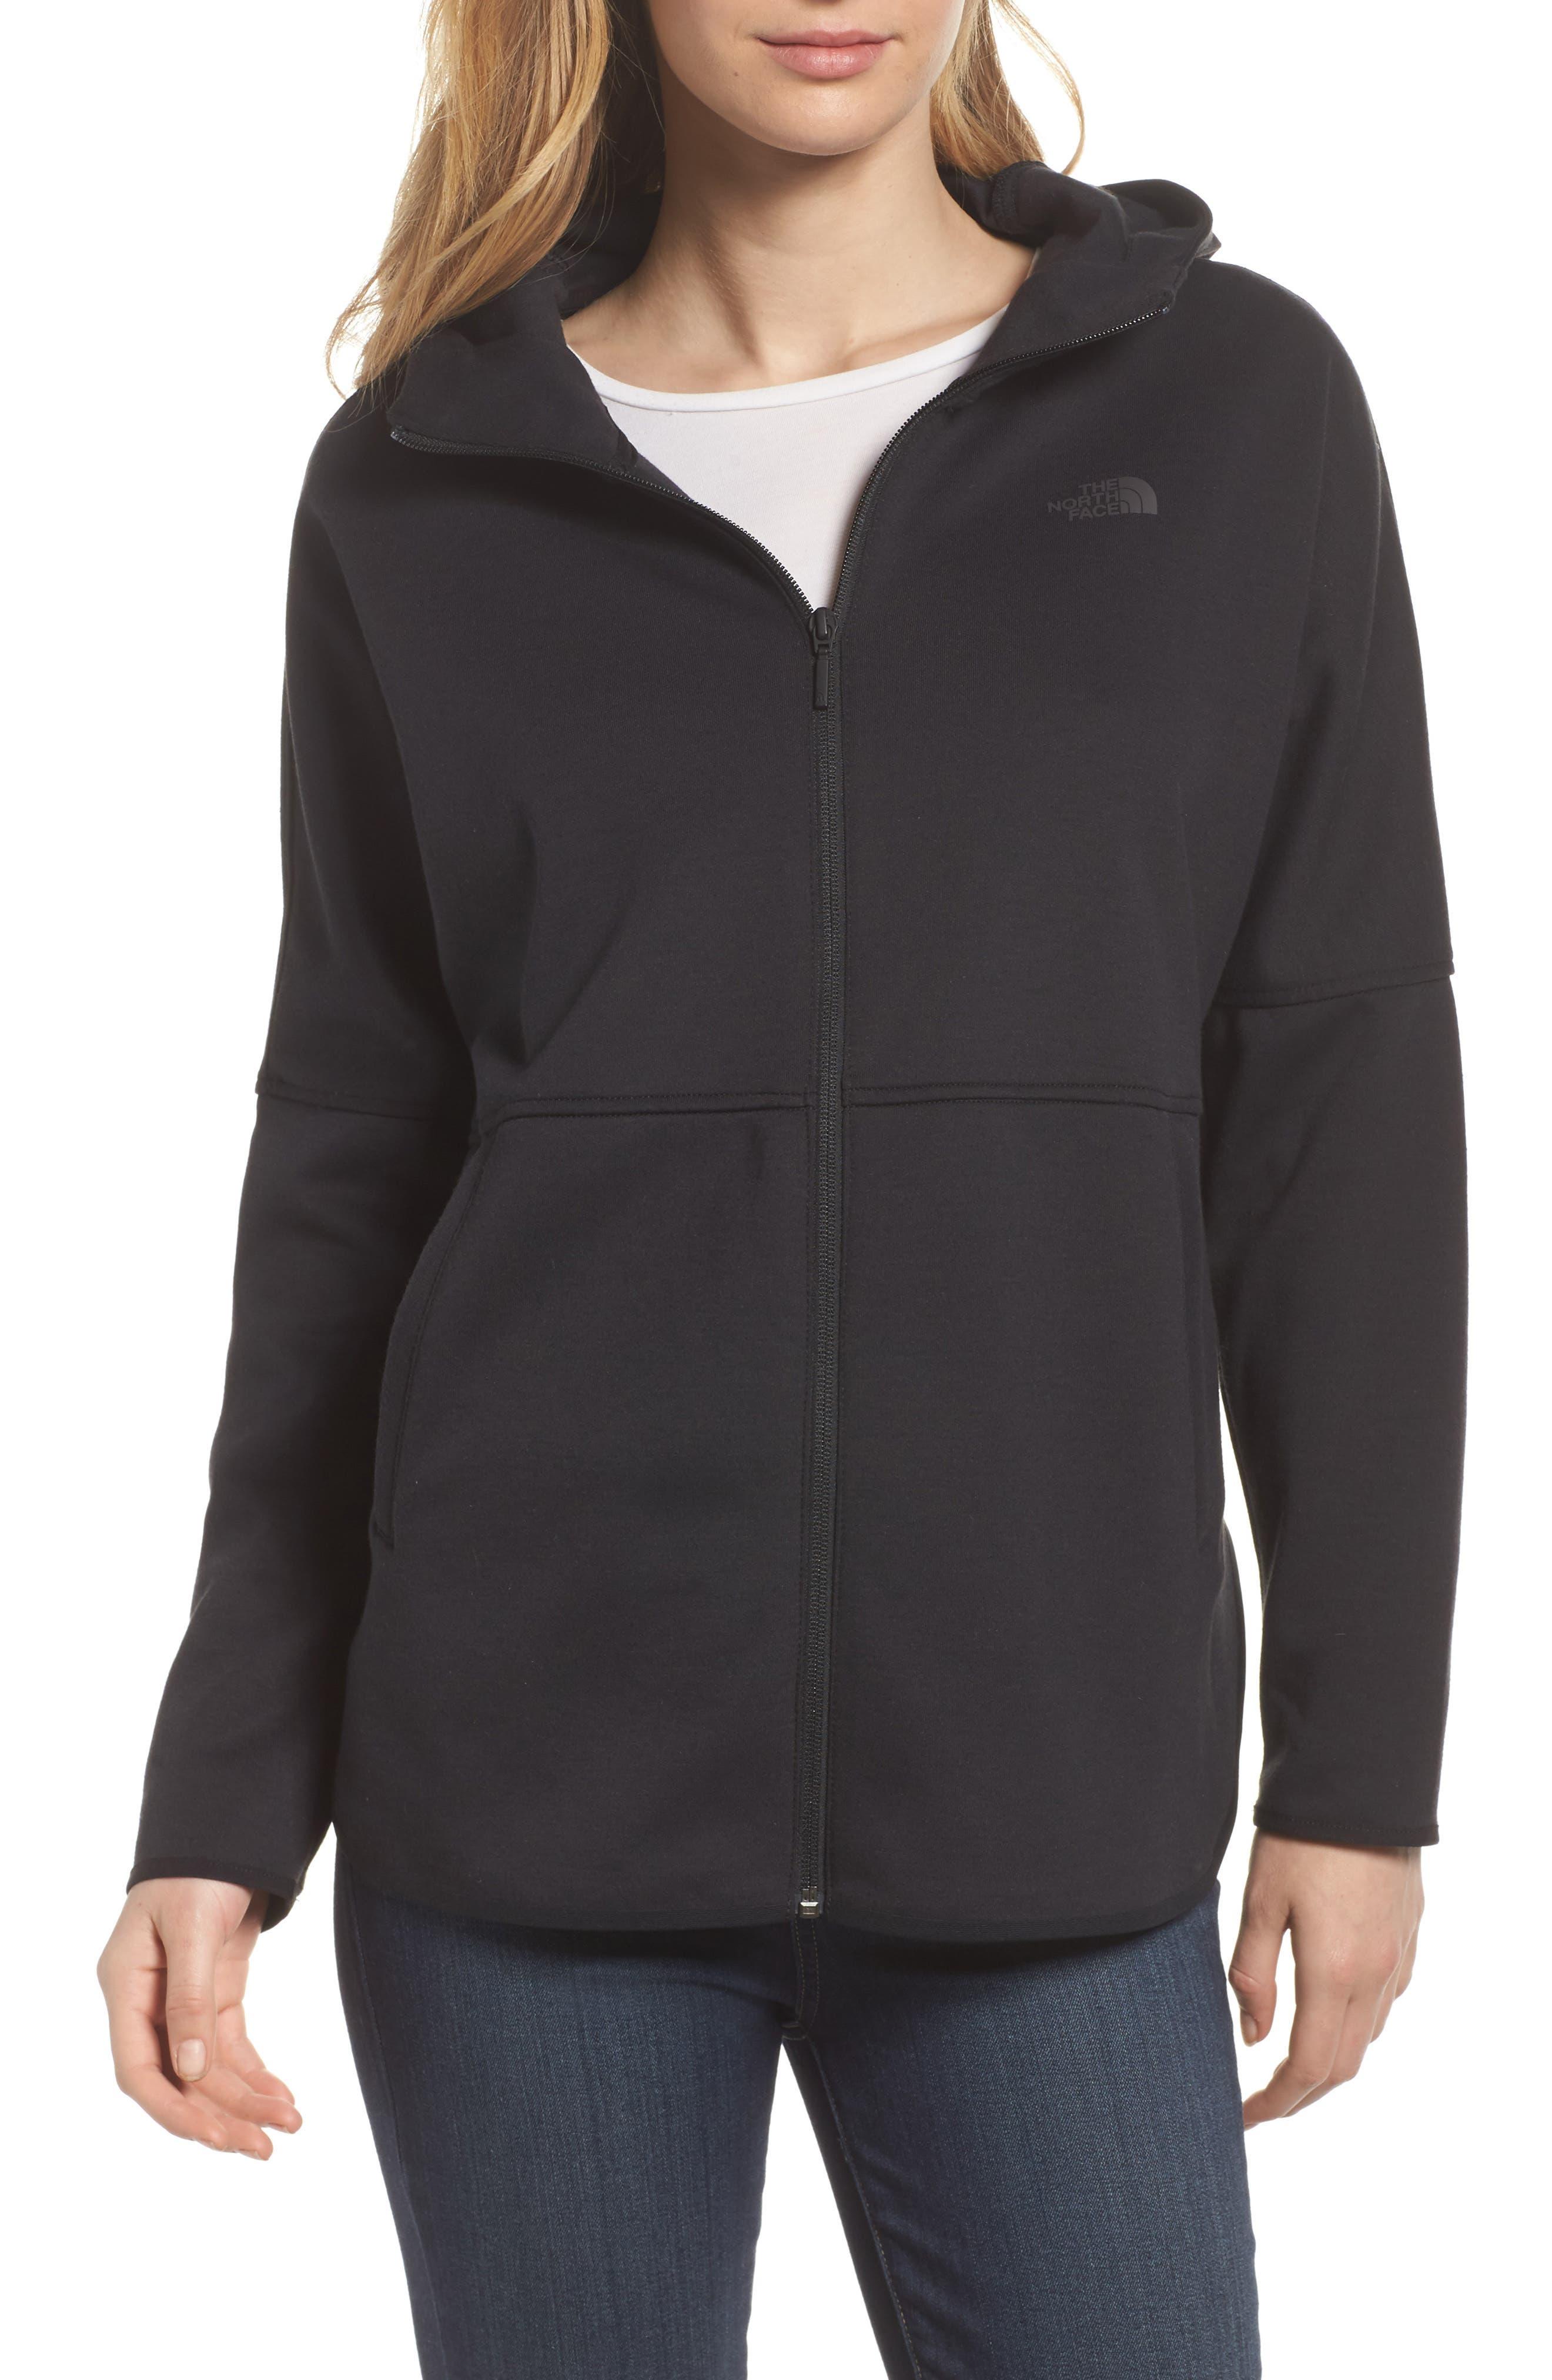 Slacker Hooded Jacket,                         Main,                         color, Tnf Black